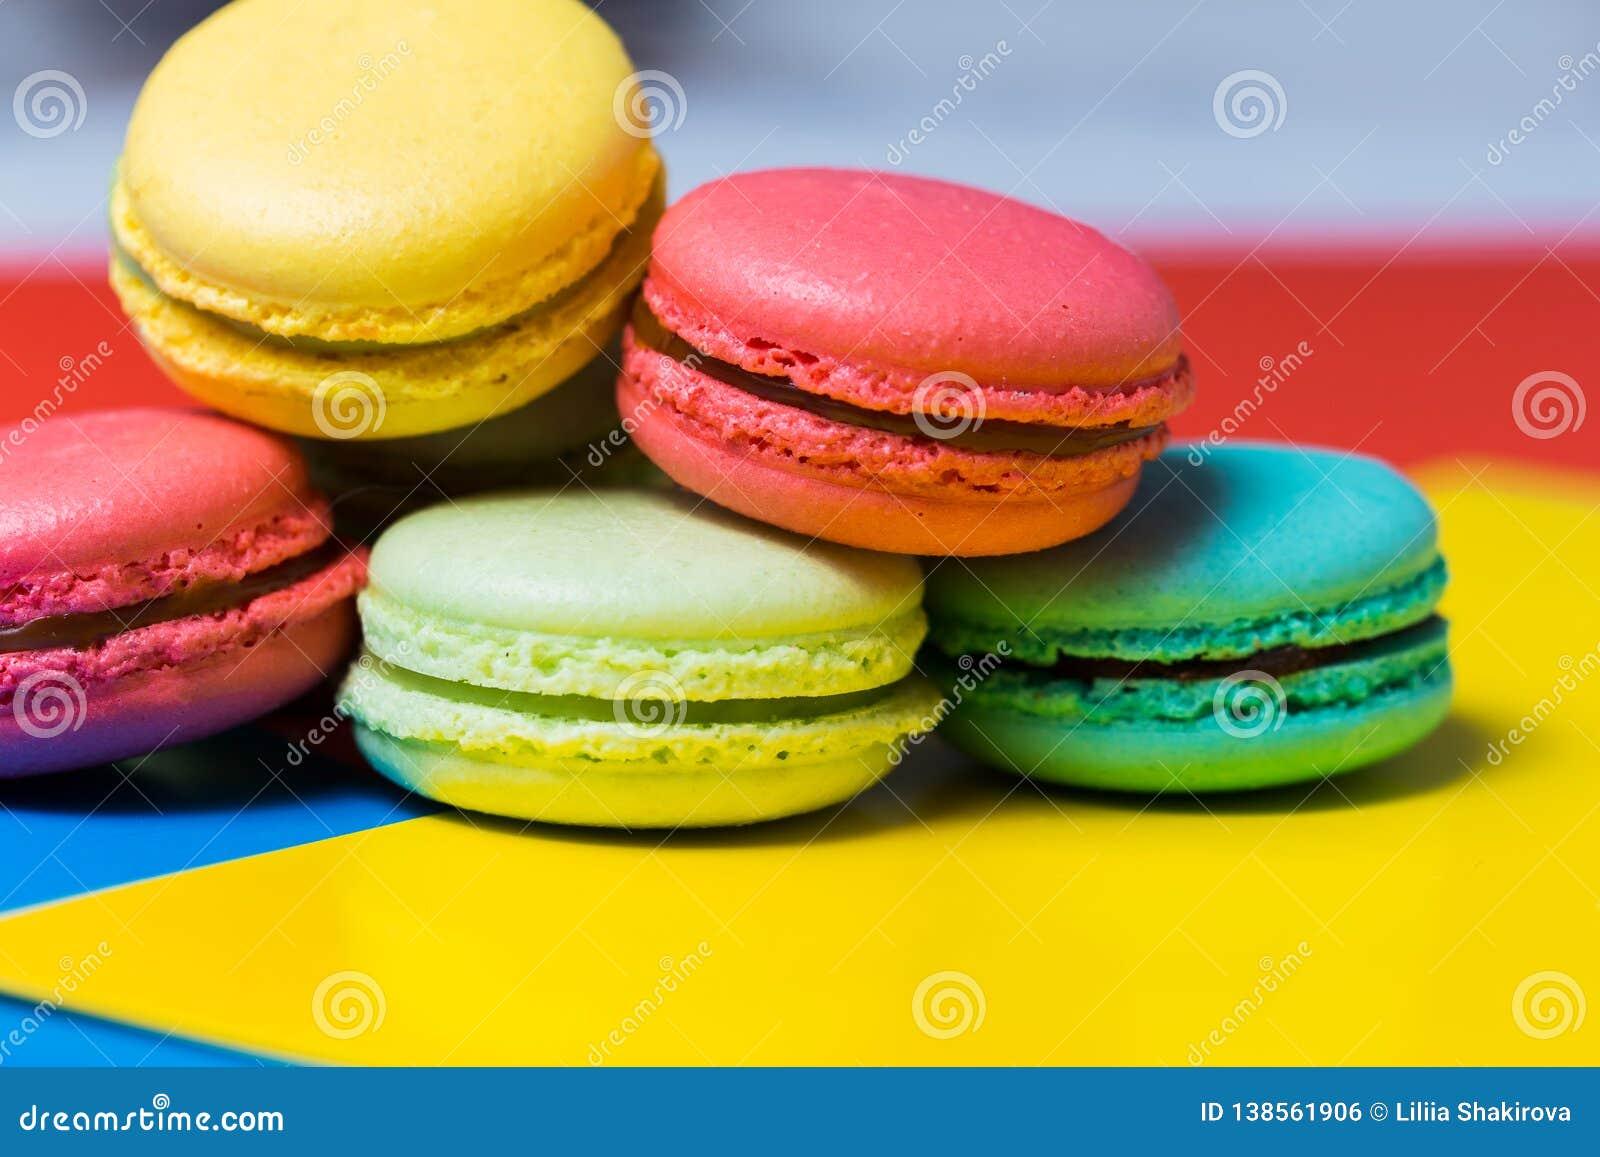 Macarrones o macaron franceses dulces y coloridos en fondo colorido Postre delicioso